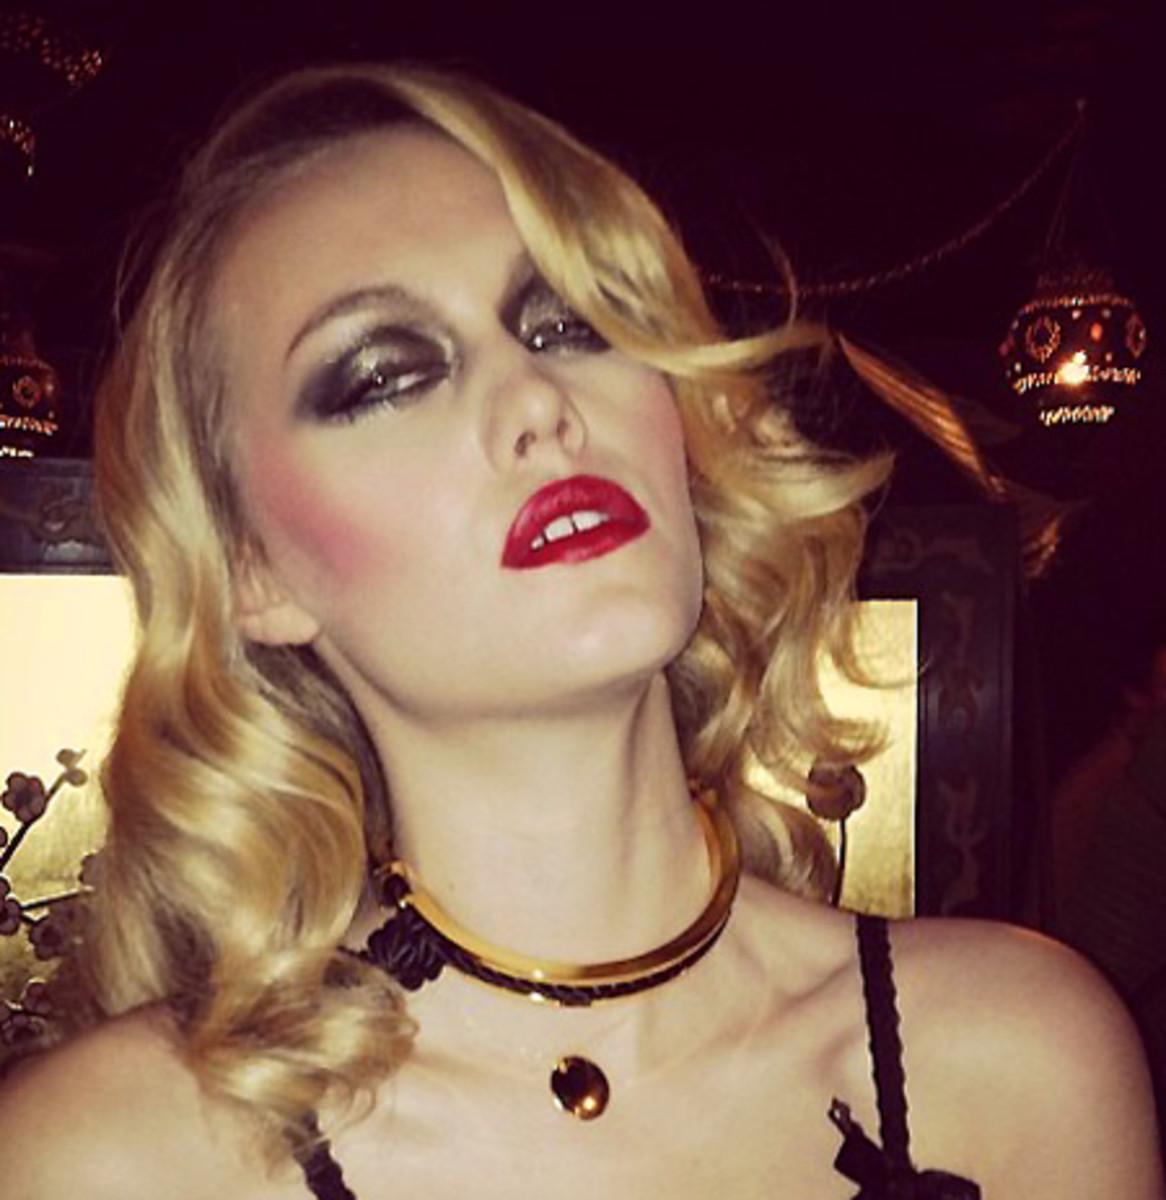 Guy Bourdin-inspired makeup_by Chanel national artist Julie Cusson_julie cusson instagram